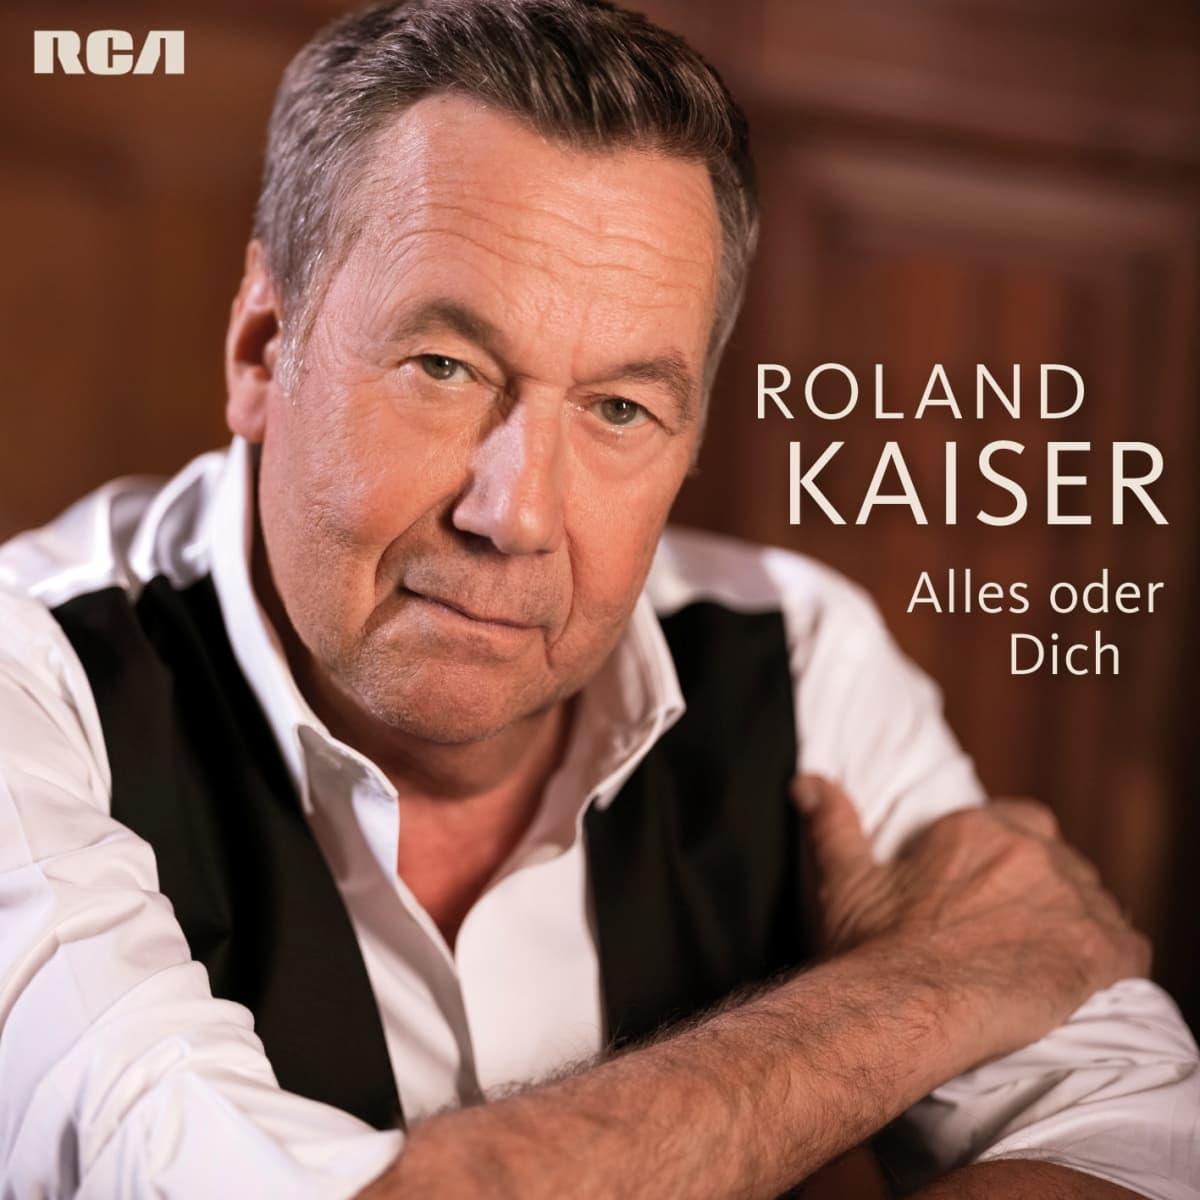 Roland Kaiser - CD Alles oder Dich 2019